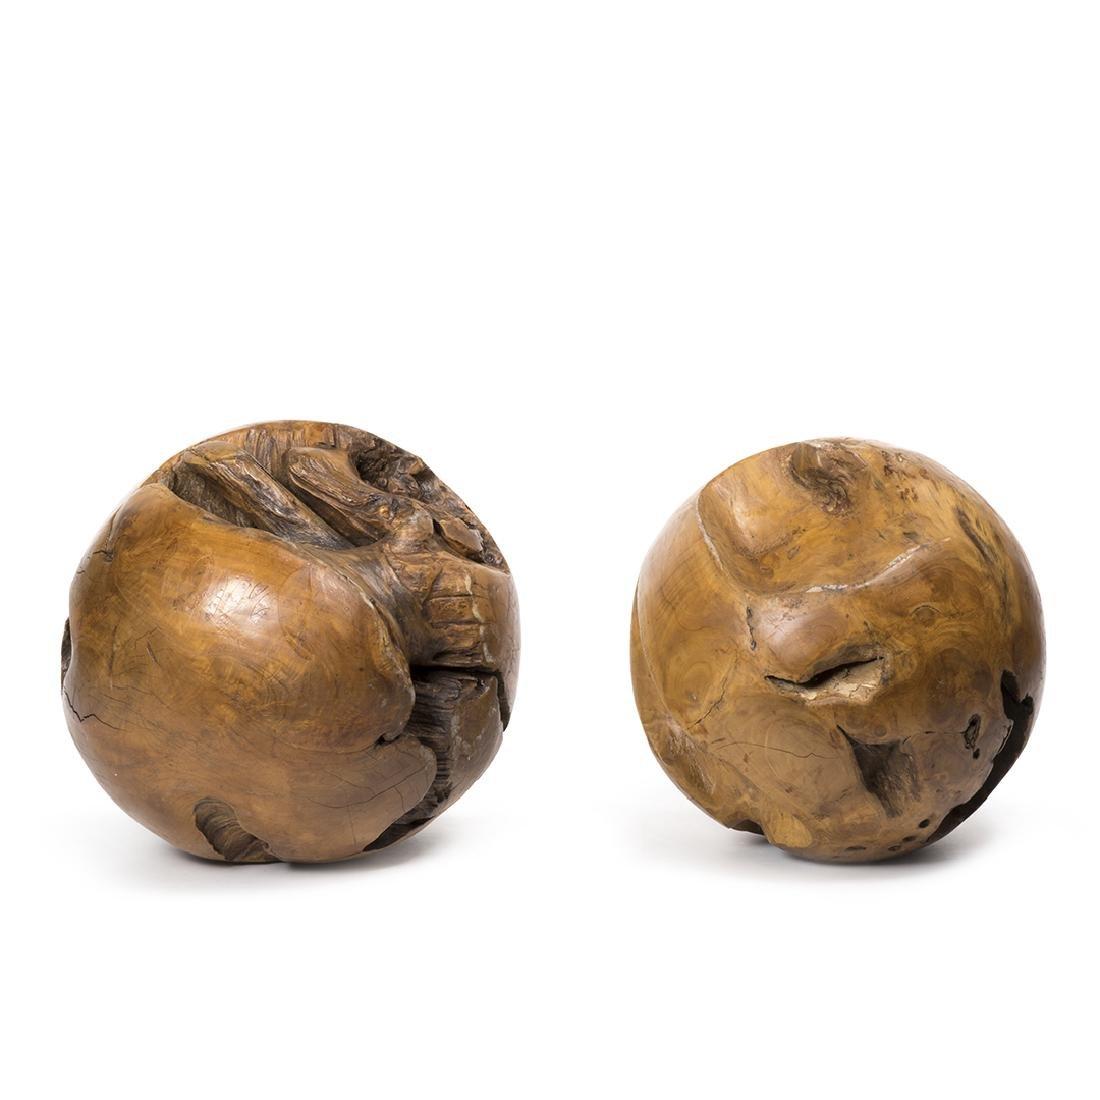 Big Burlwood Balls (2)